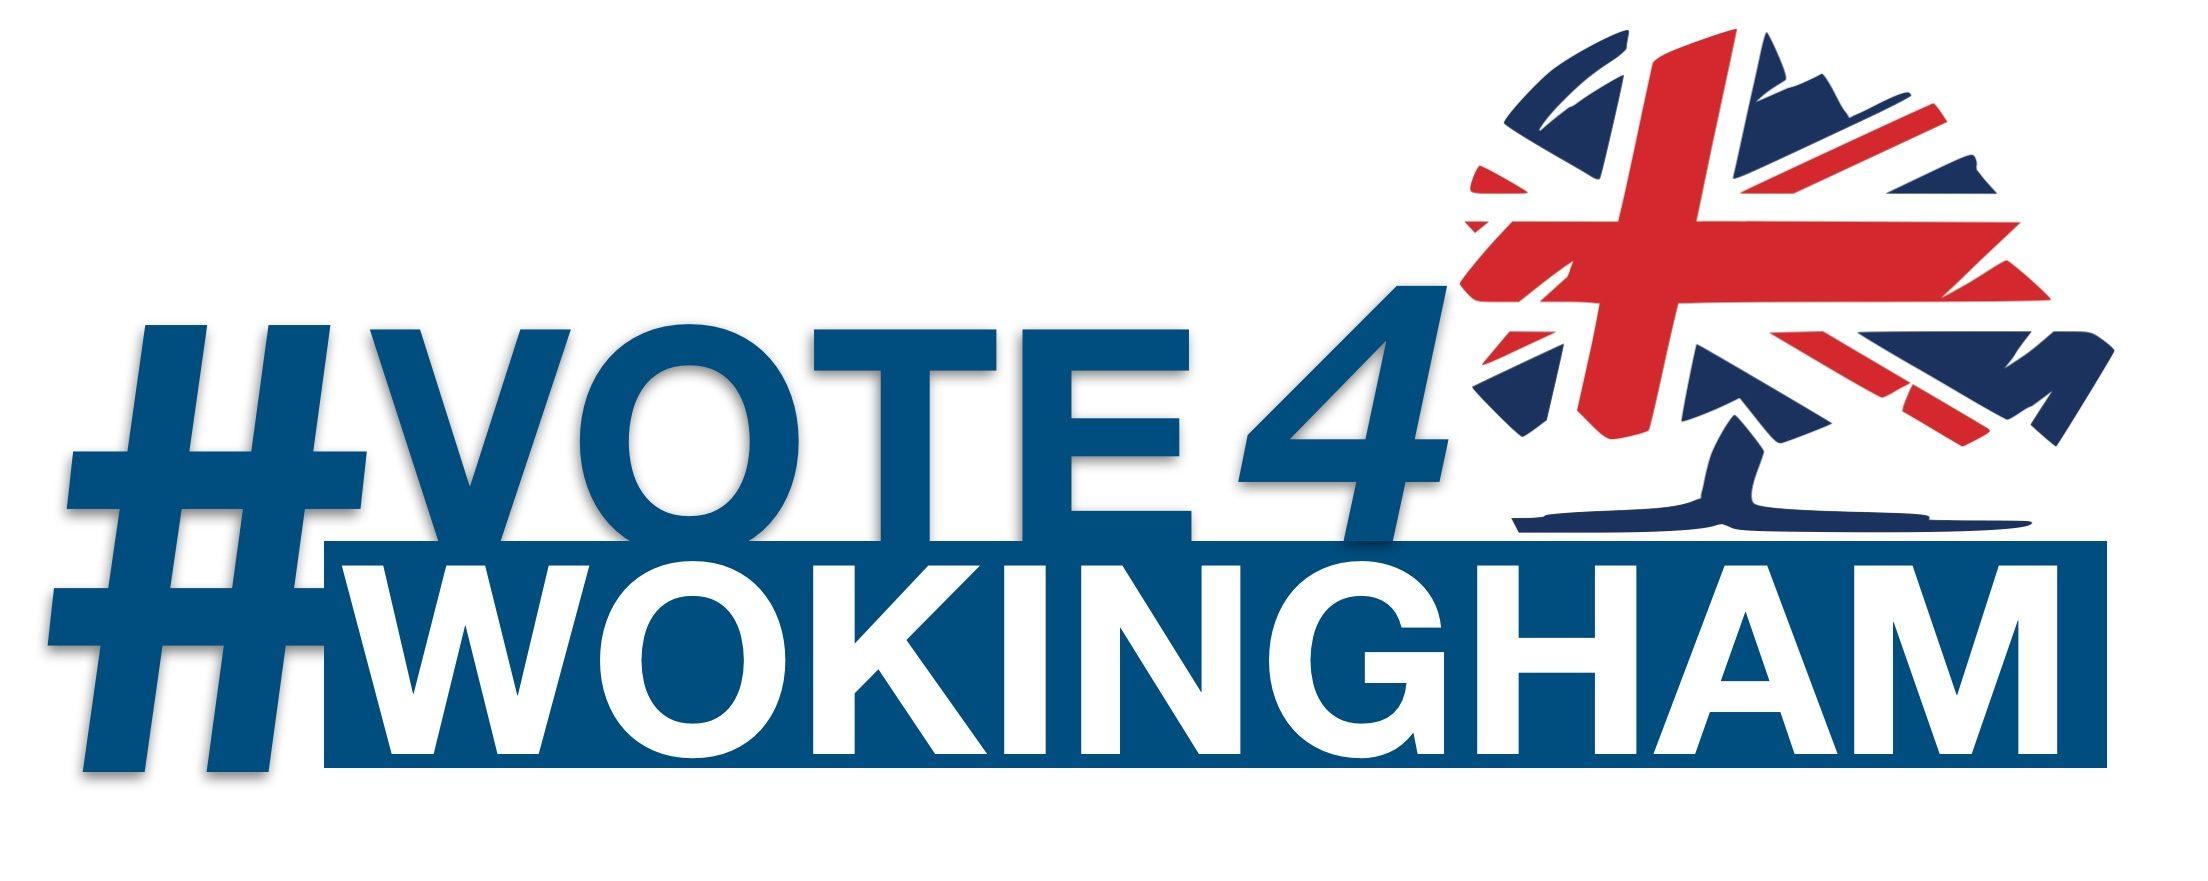 Vote4Wokingham